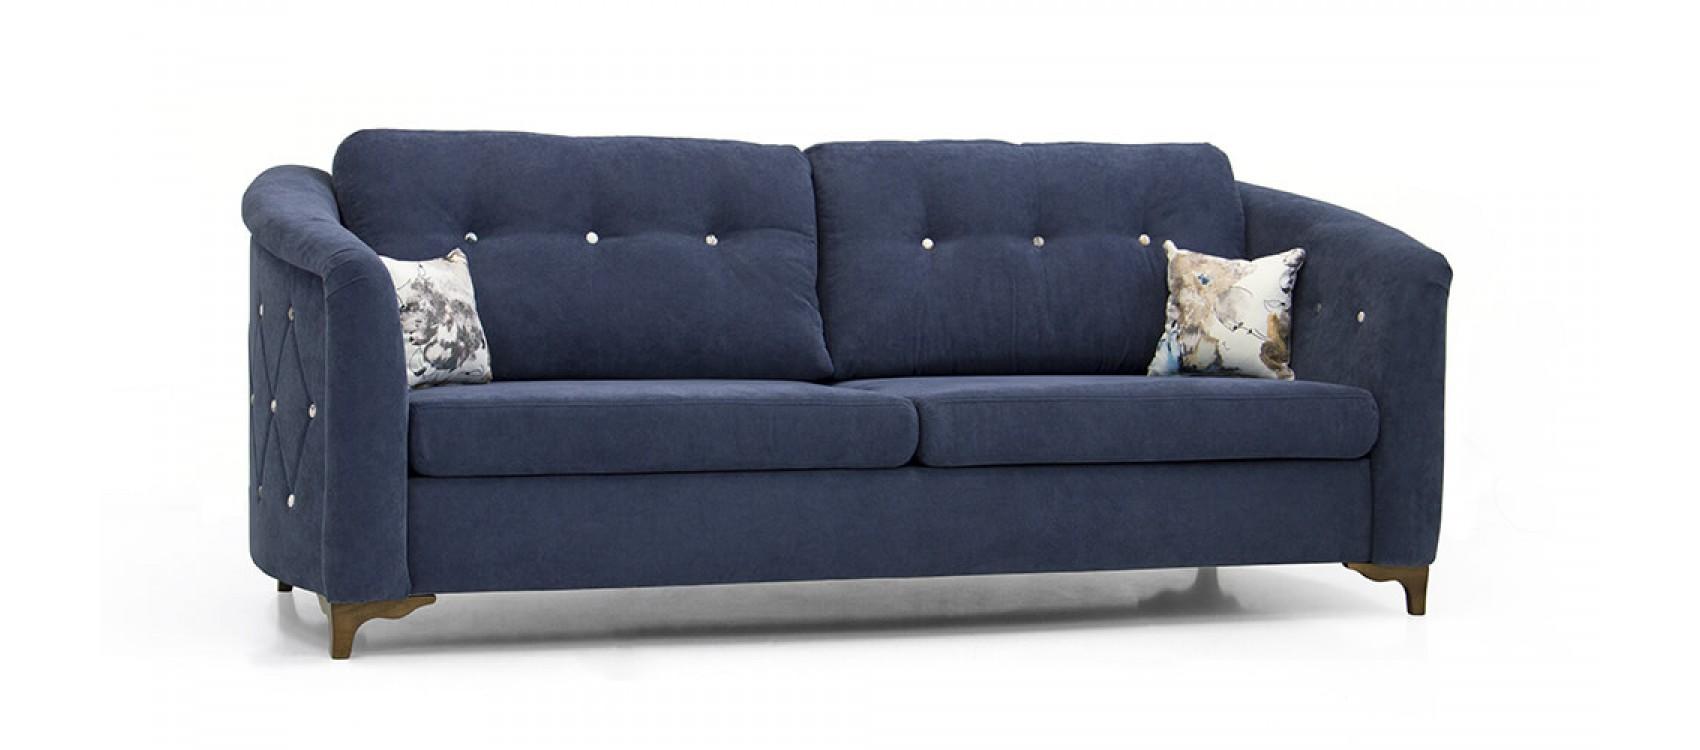 Sofa MAXBURG фото 2